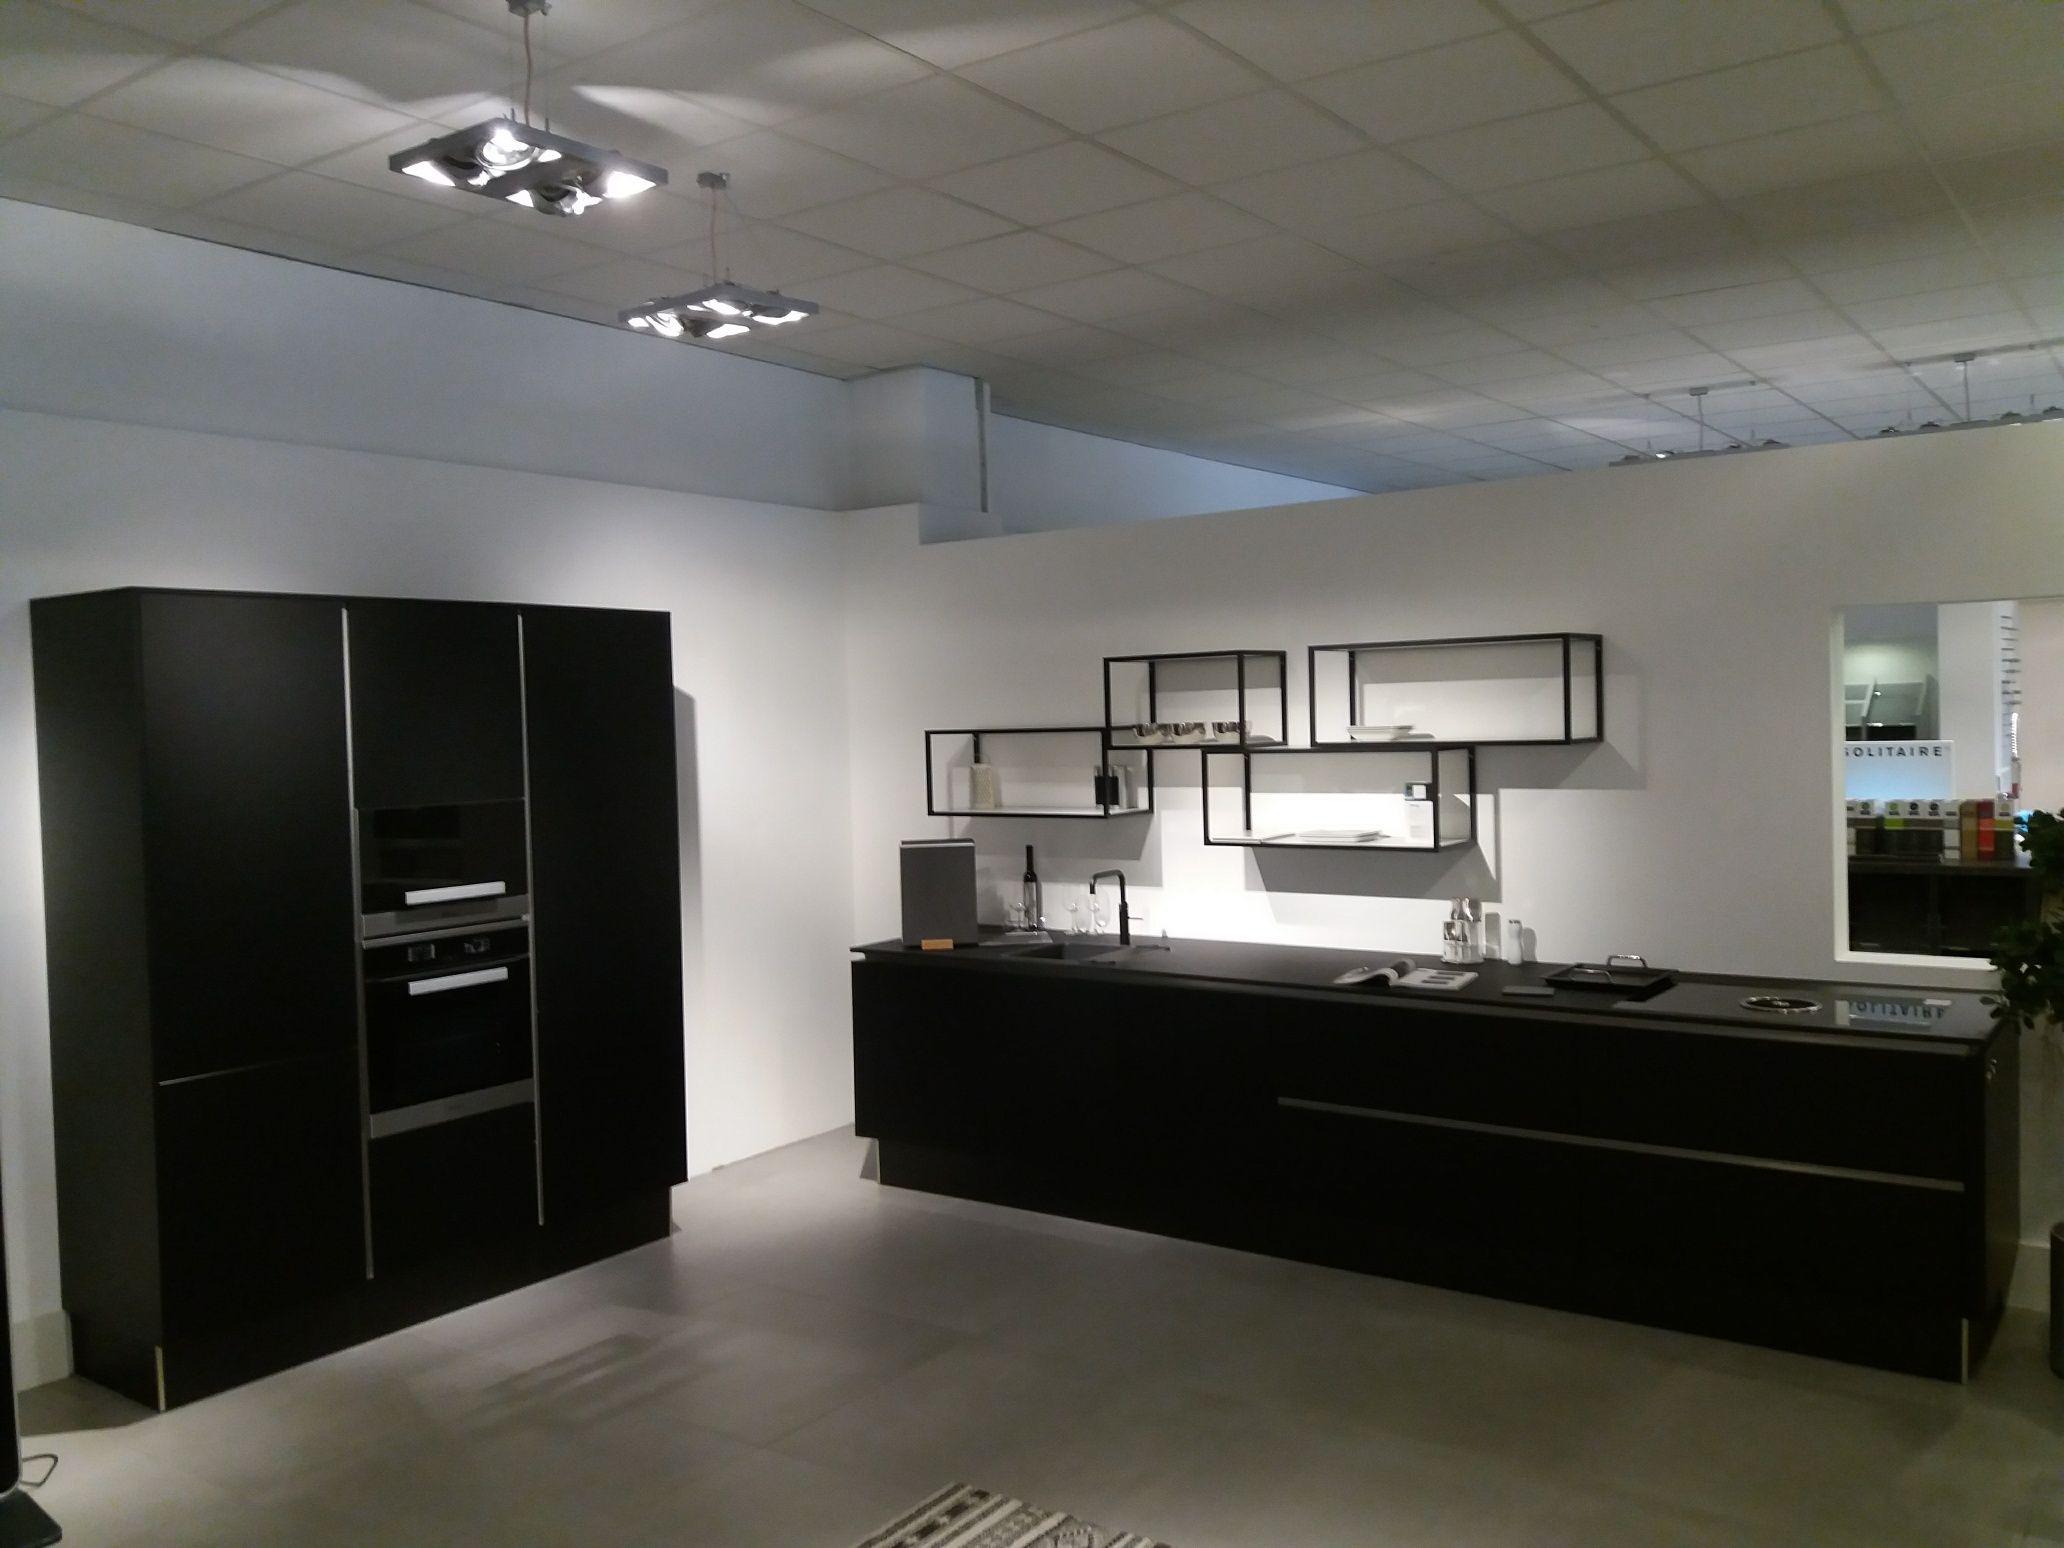 Greeploze Design Keukens : Keukentrack.nl allergrootste keukensite van nederland zwarte